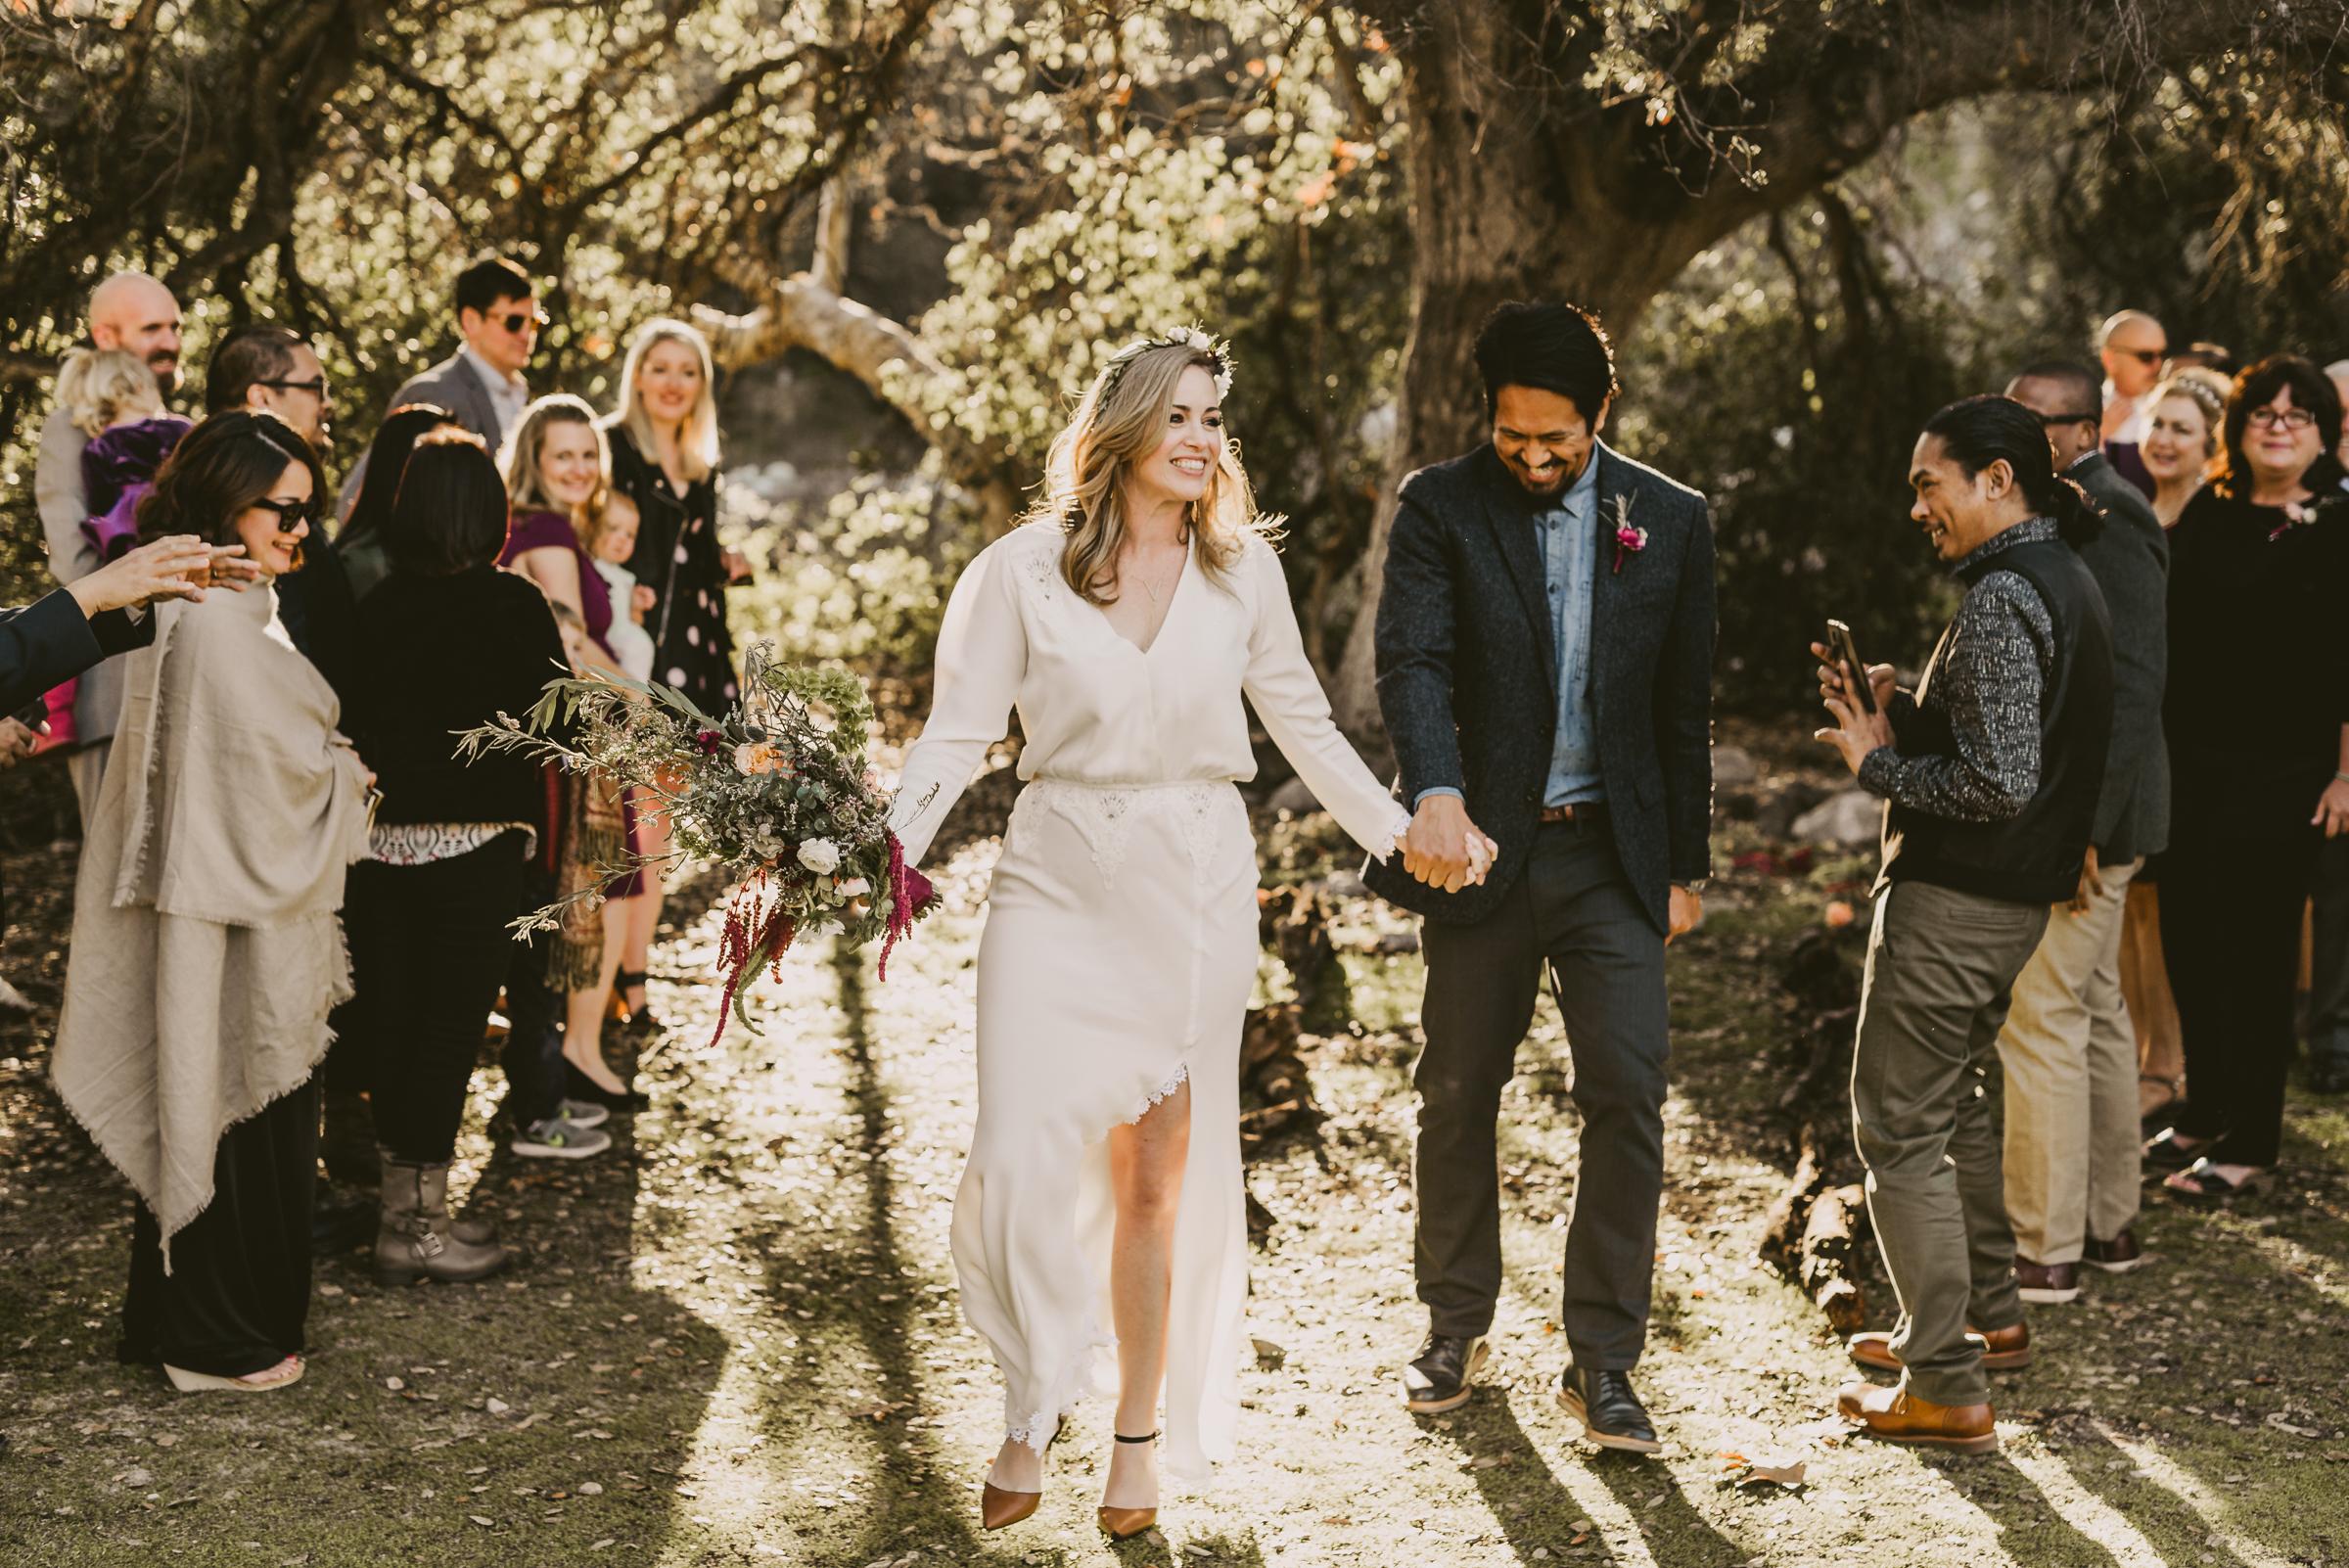 ©Isaiah + Taylor Photography - Intimate Elopement, Eaton Canyon, Los Angeles Wedding Photographer-41.jpg